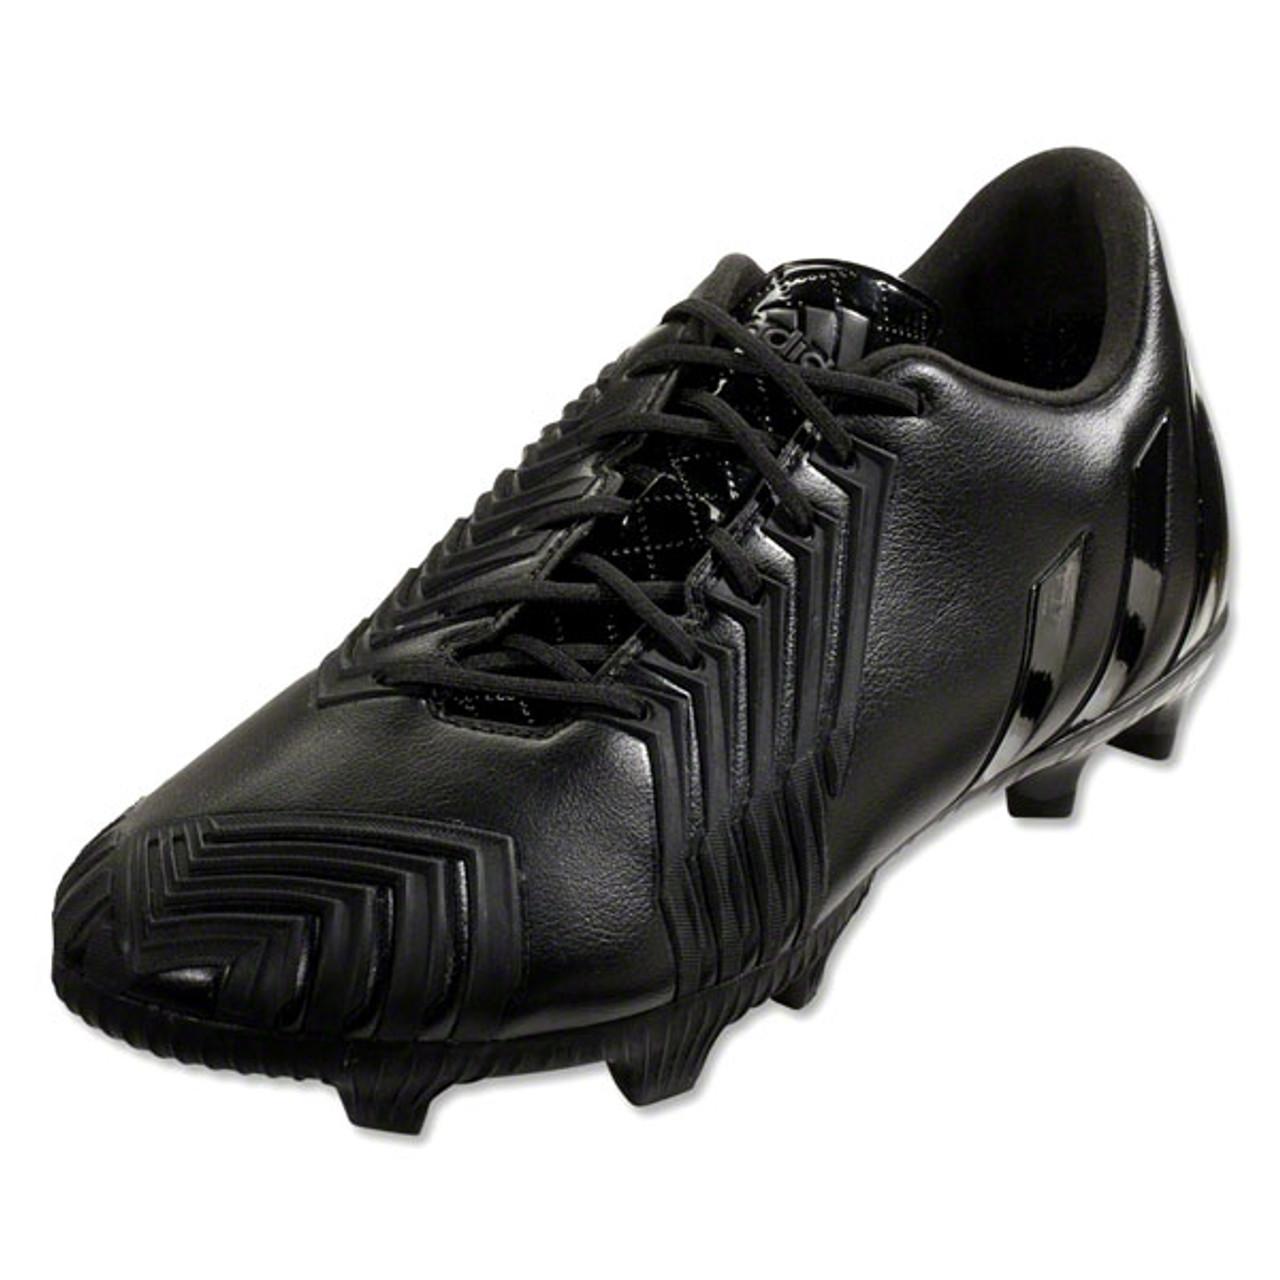 e886e5cfedff ADIDAS PREDATOR INSTINCT F FG BLACK - Soccer Plus